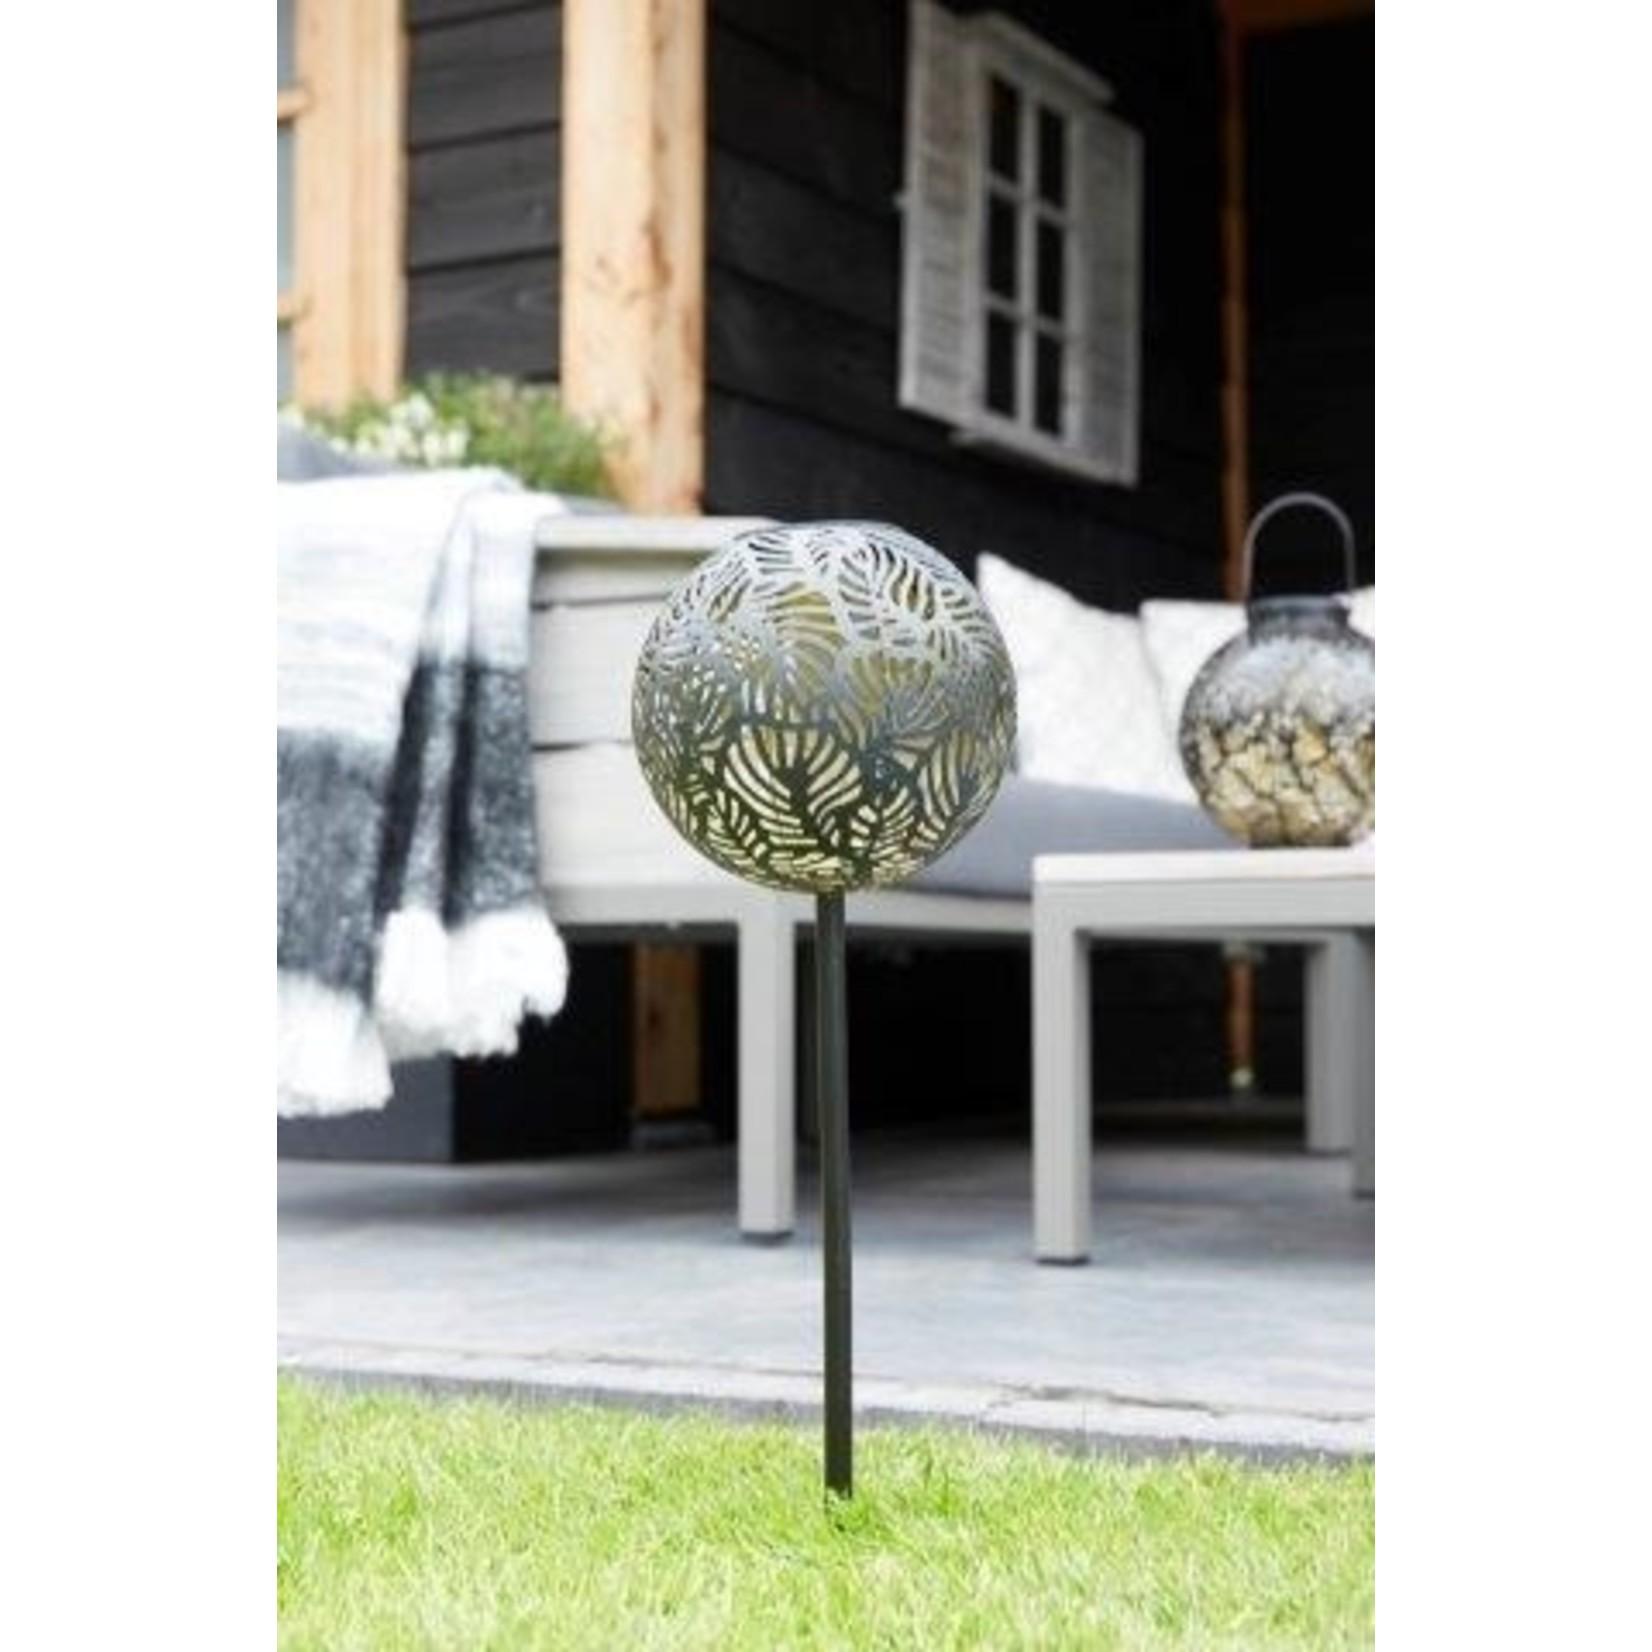 Luxform Luxform Solar tuinlamp Samba